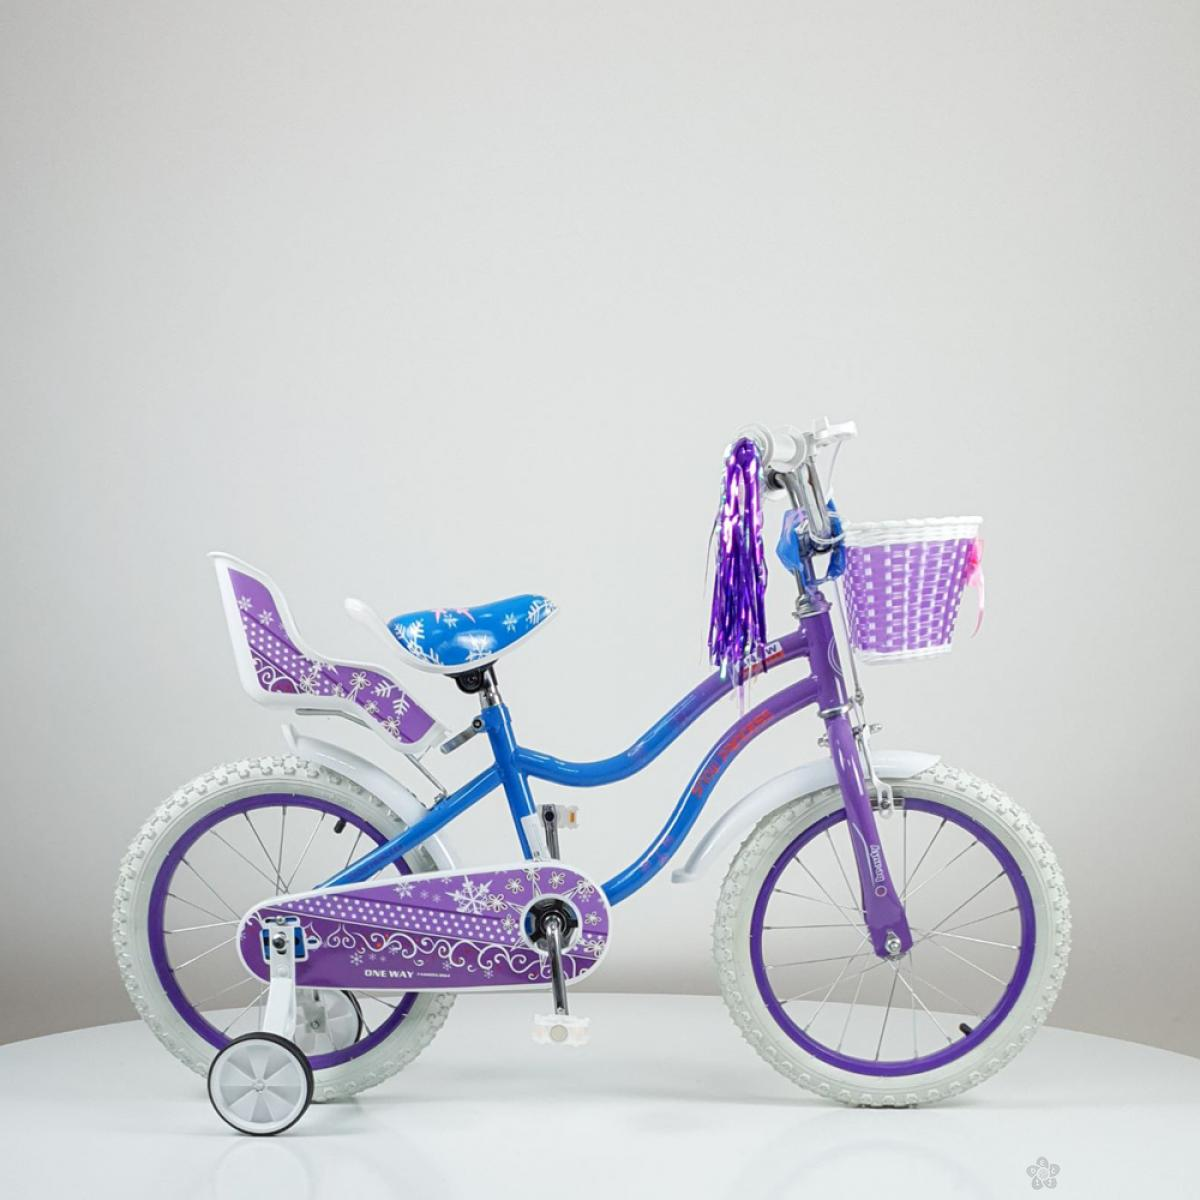 Dečiji bicikl Snow Princess model 716-16 ljubičasti